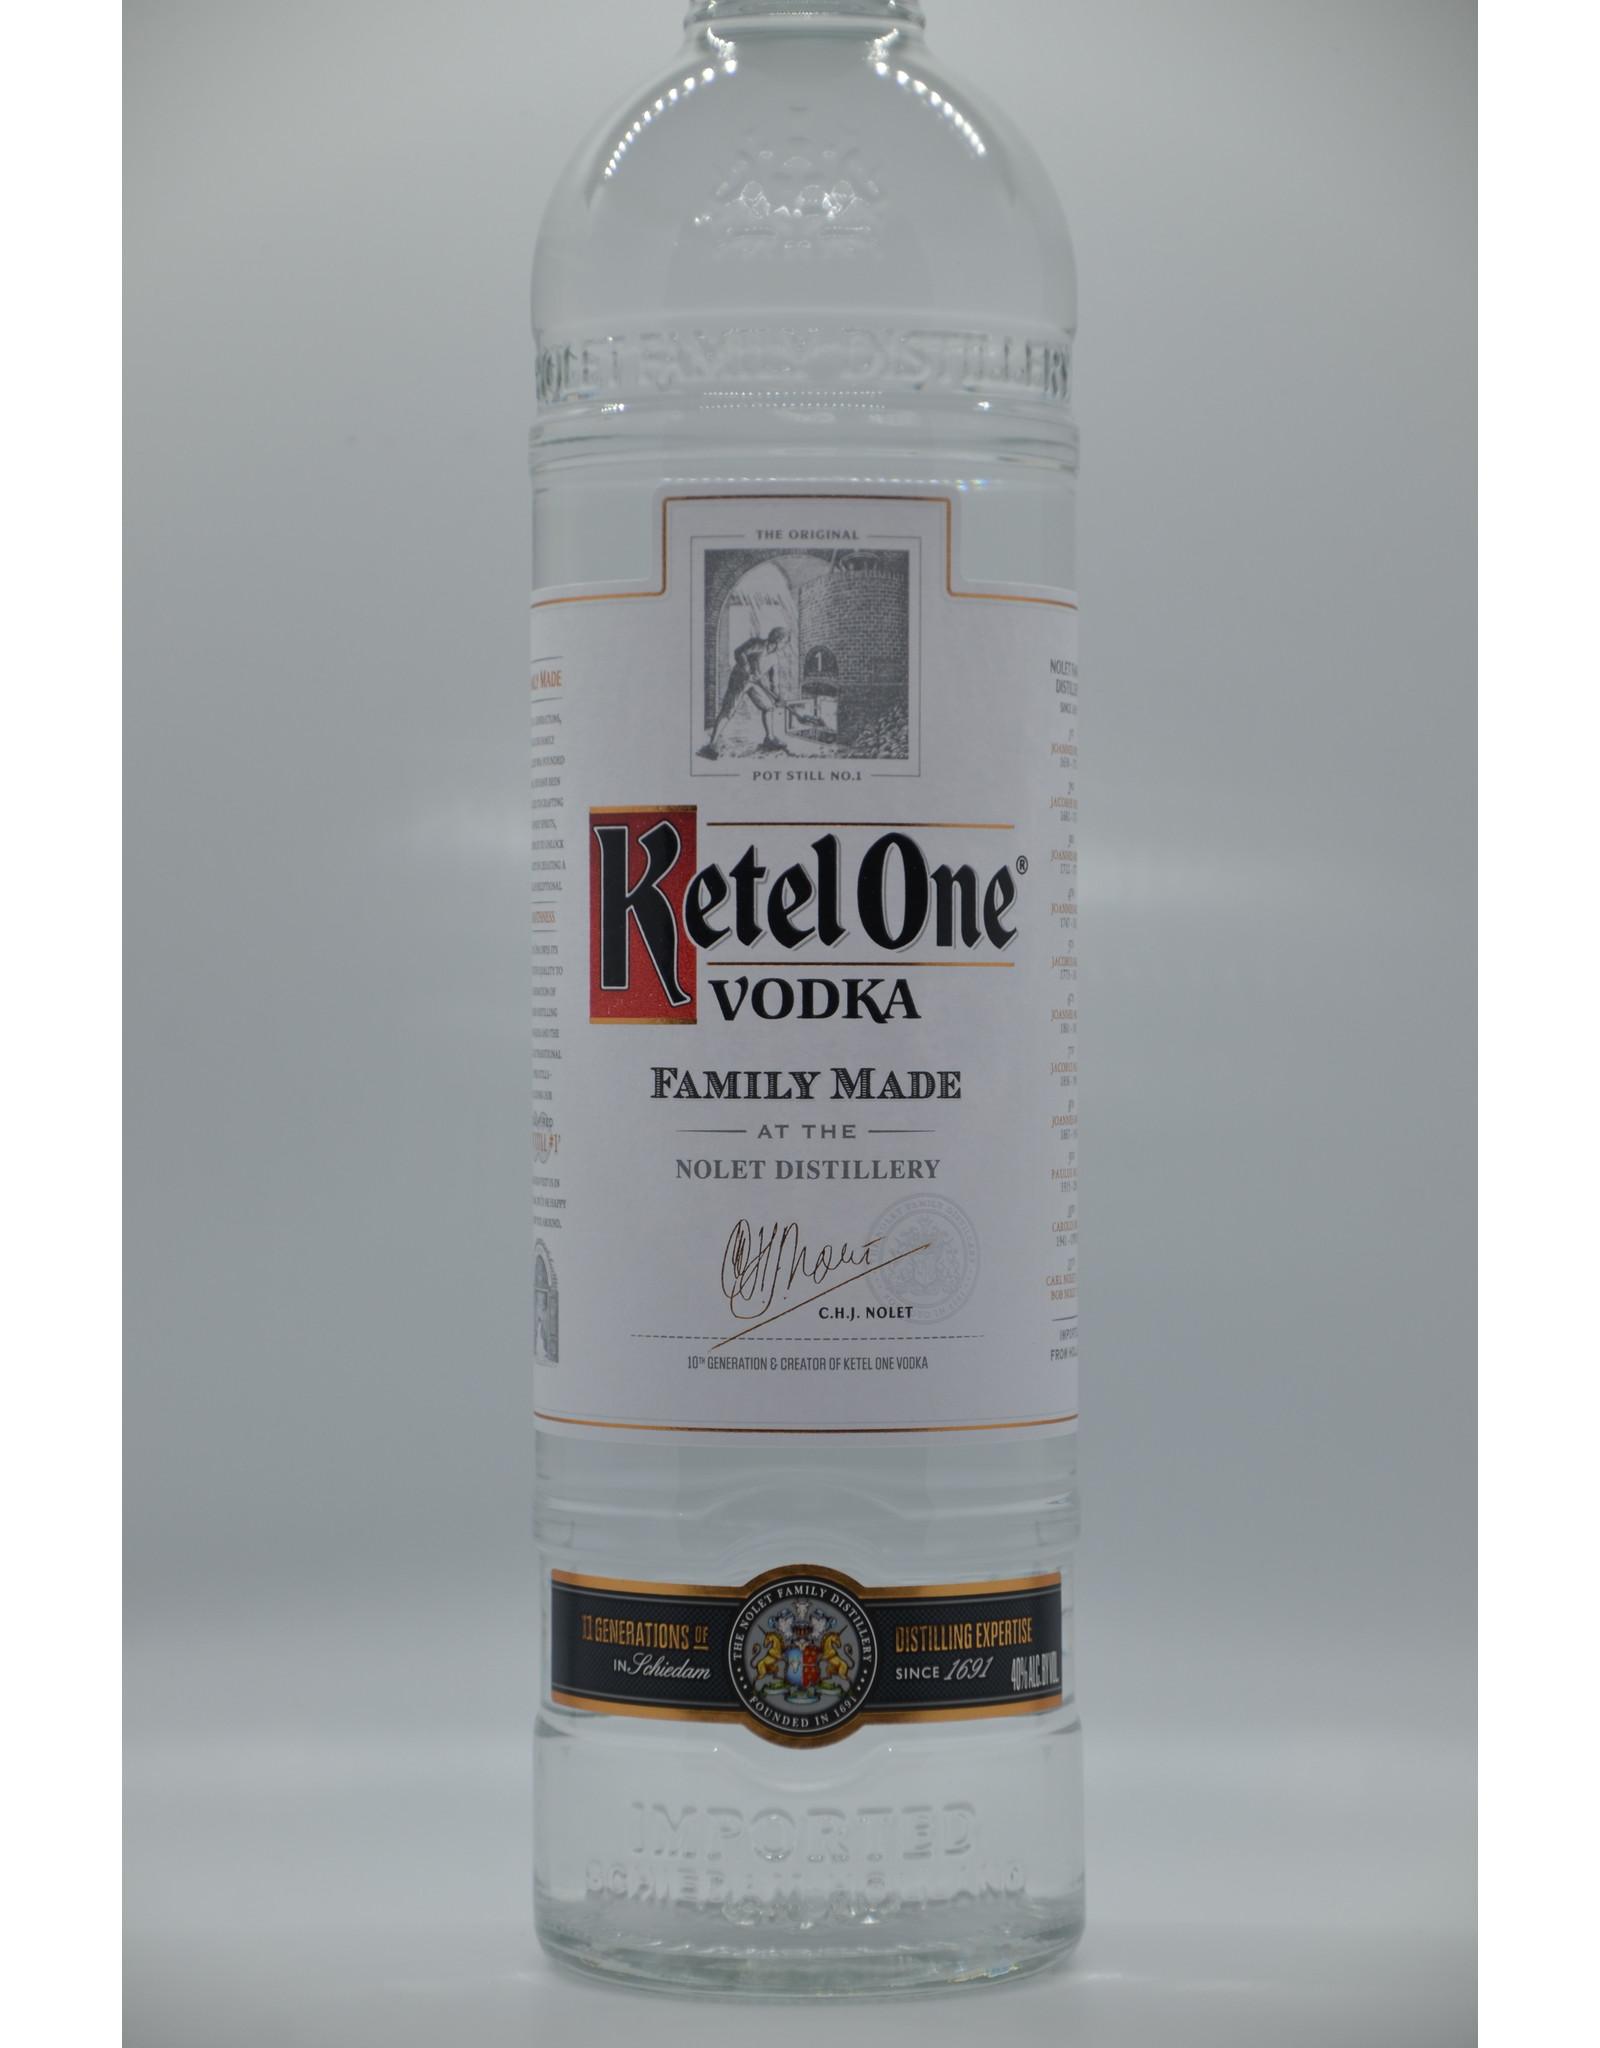 Holland Ketel One 750ml